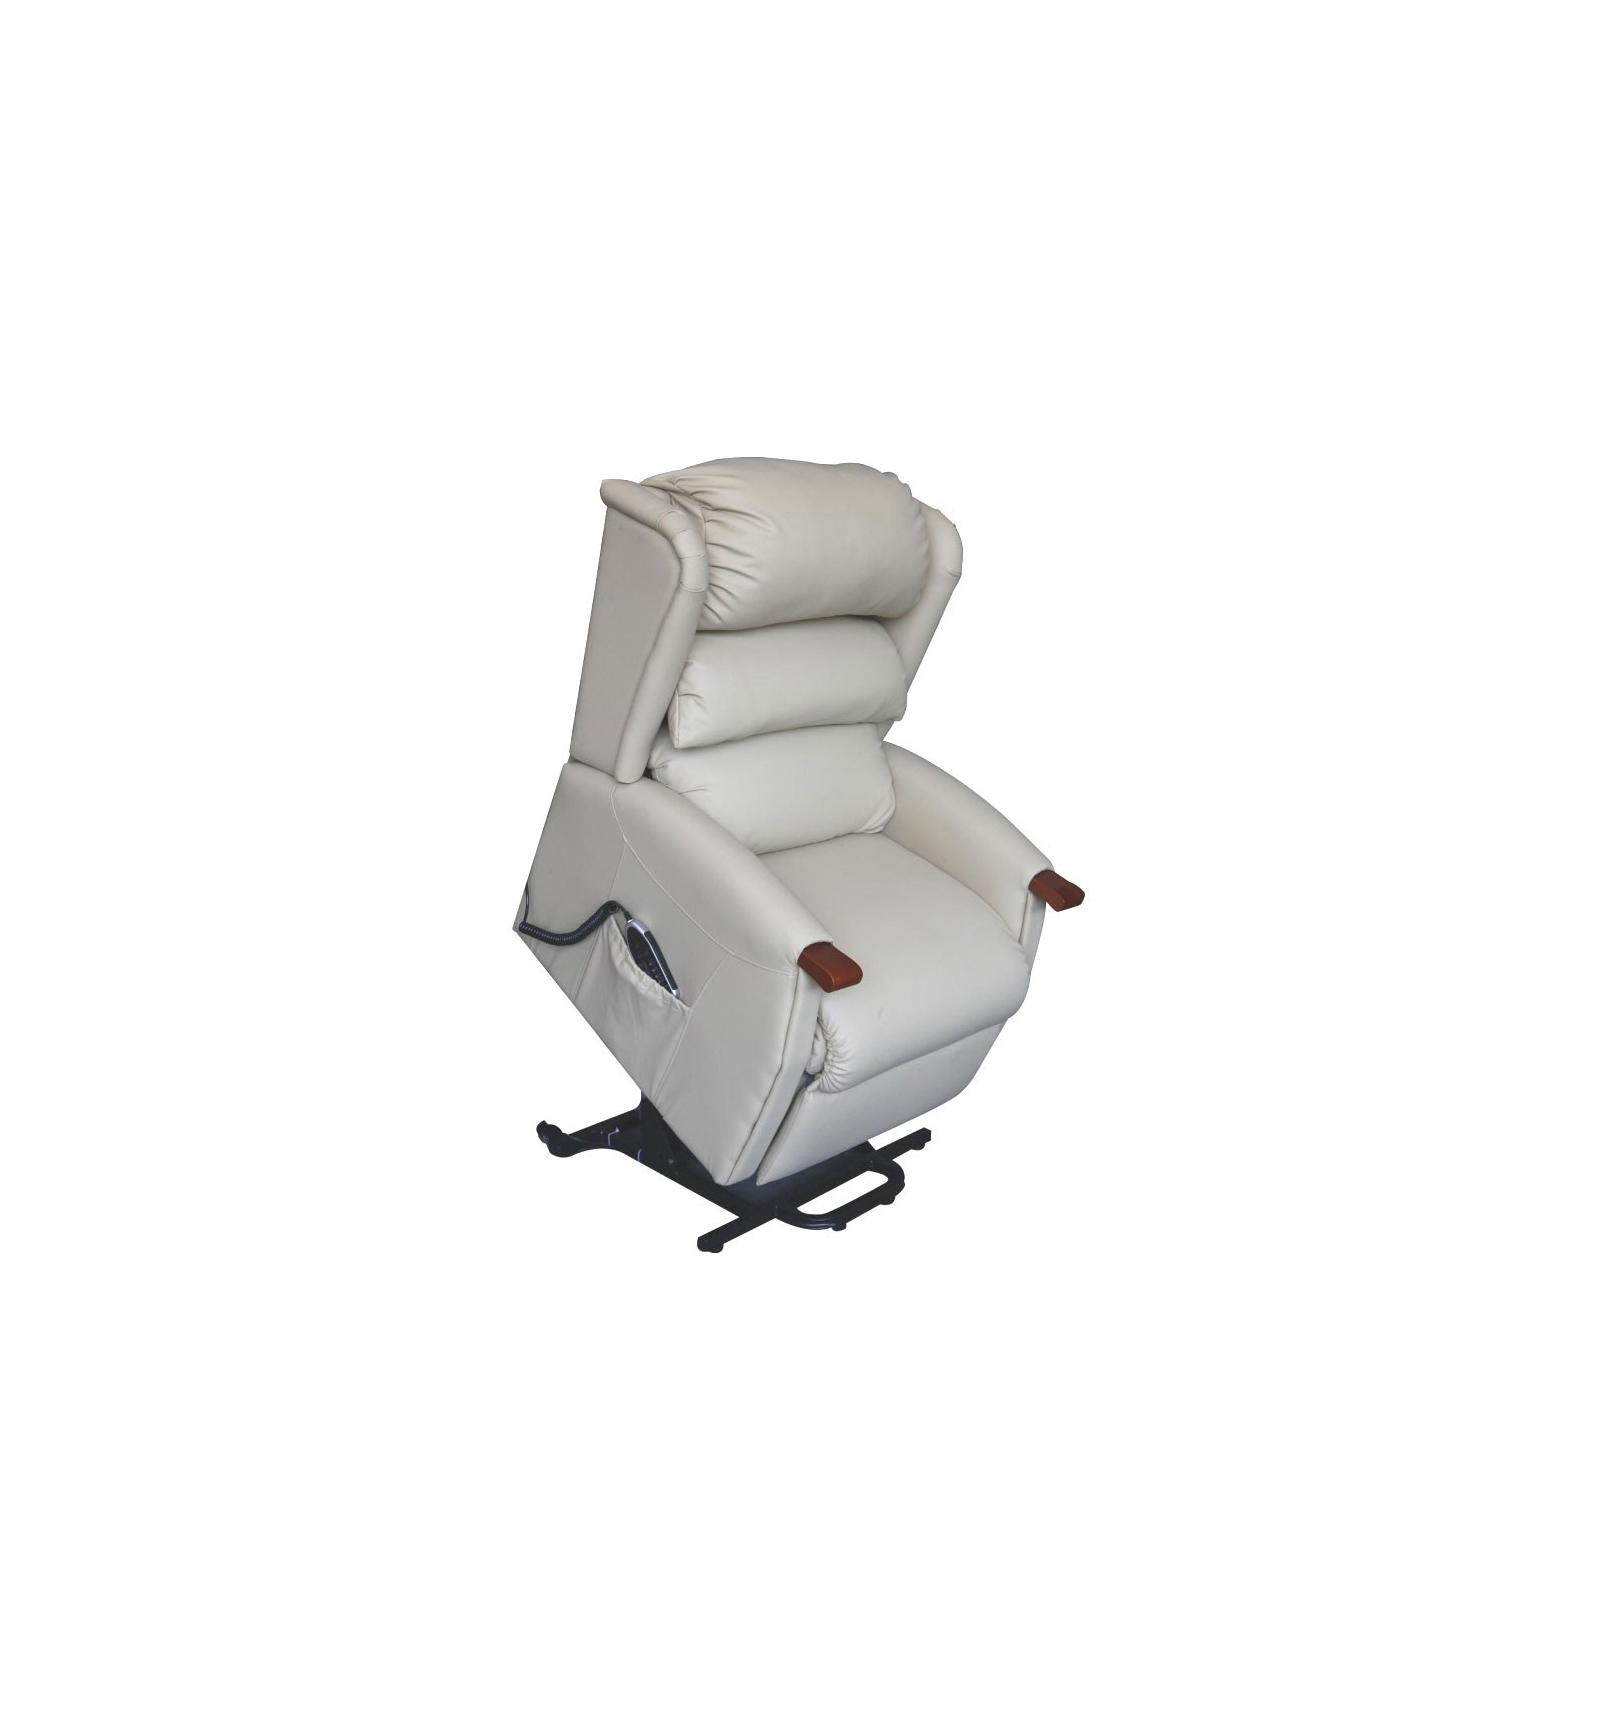 Relaxsessel Elektrisch Verstellbar relaxsessel elektrisch verstellbar